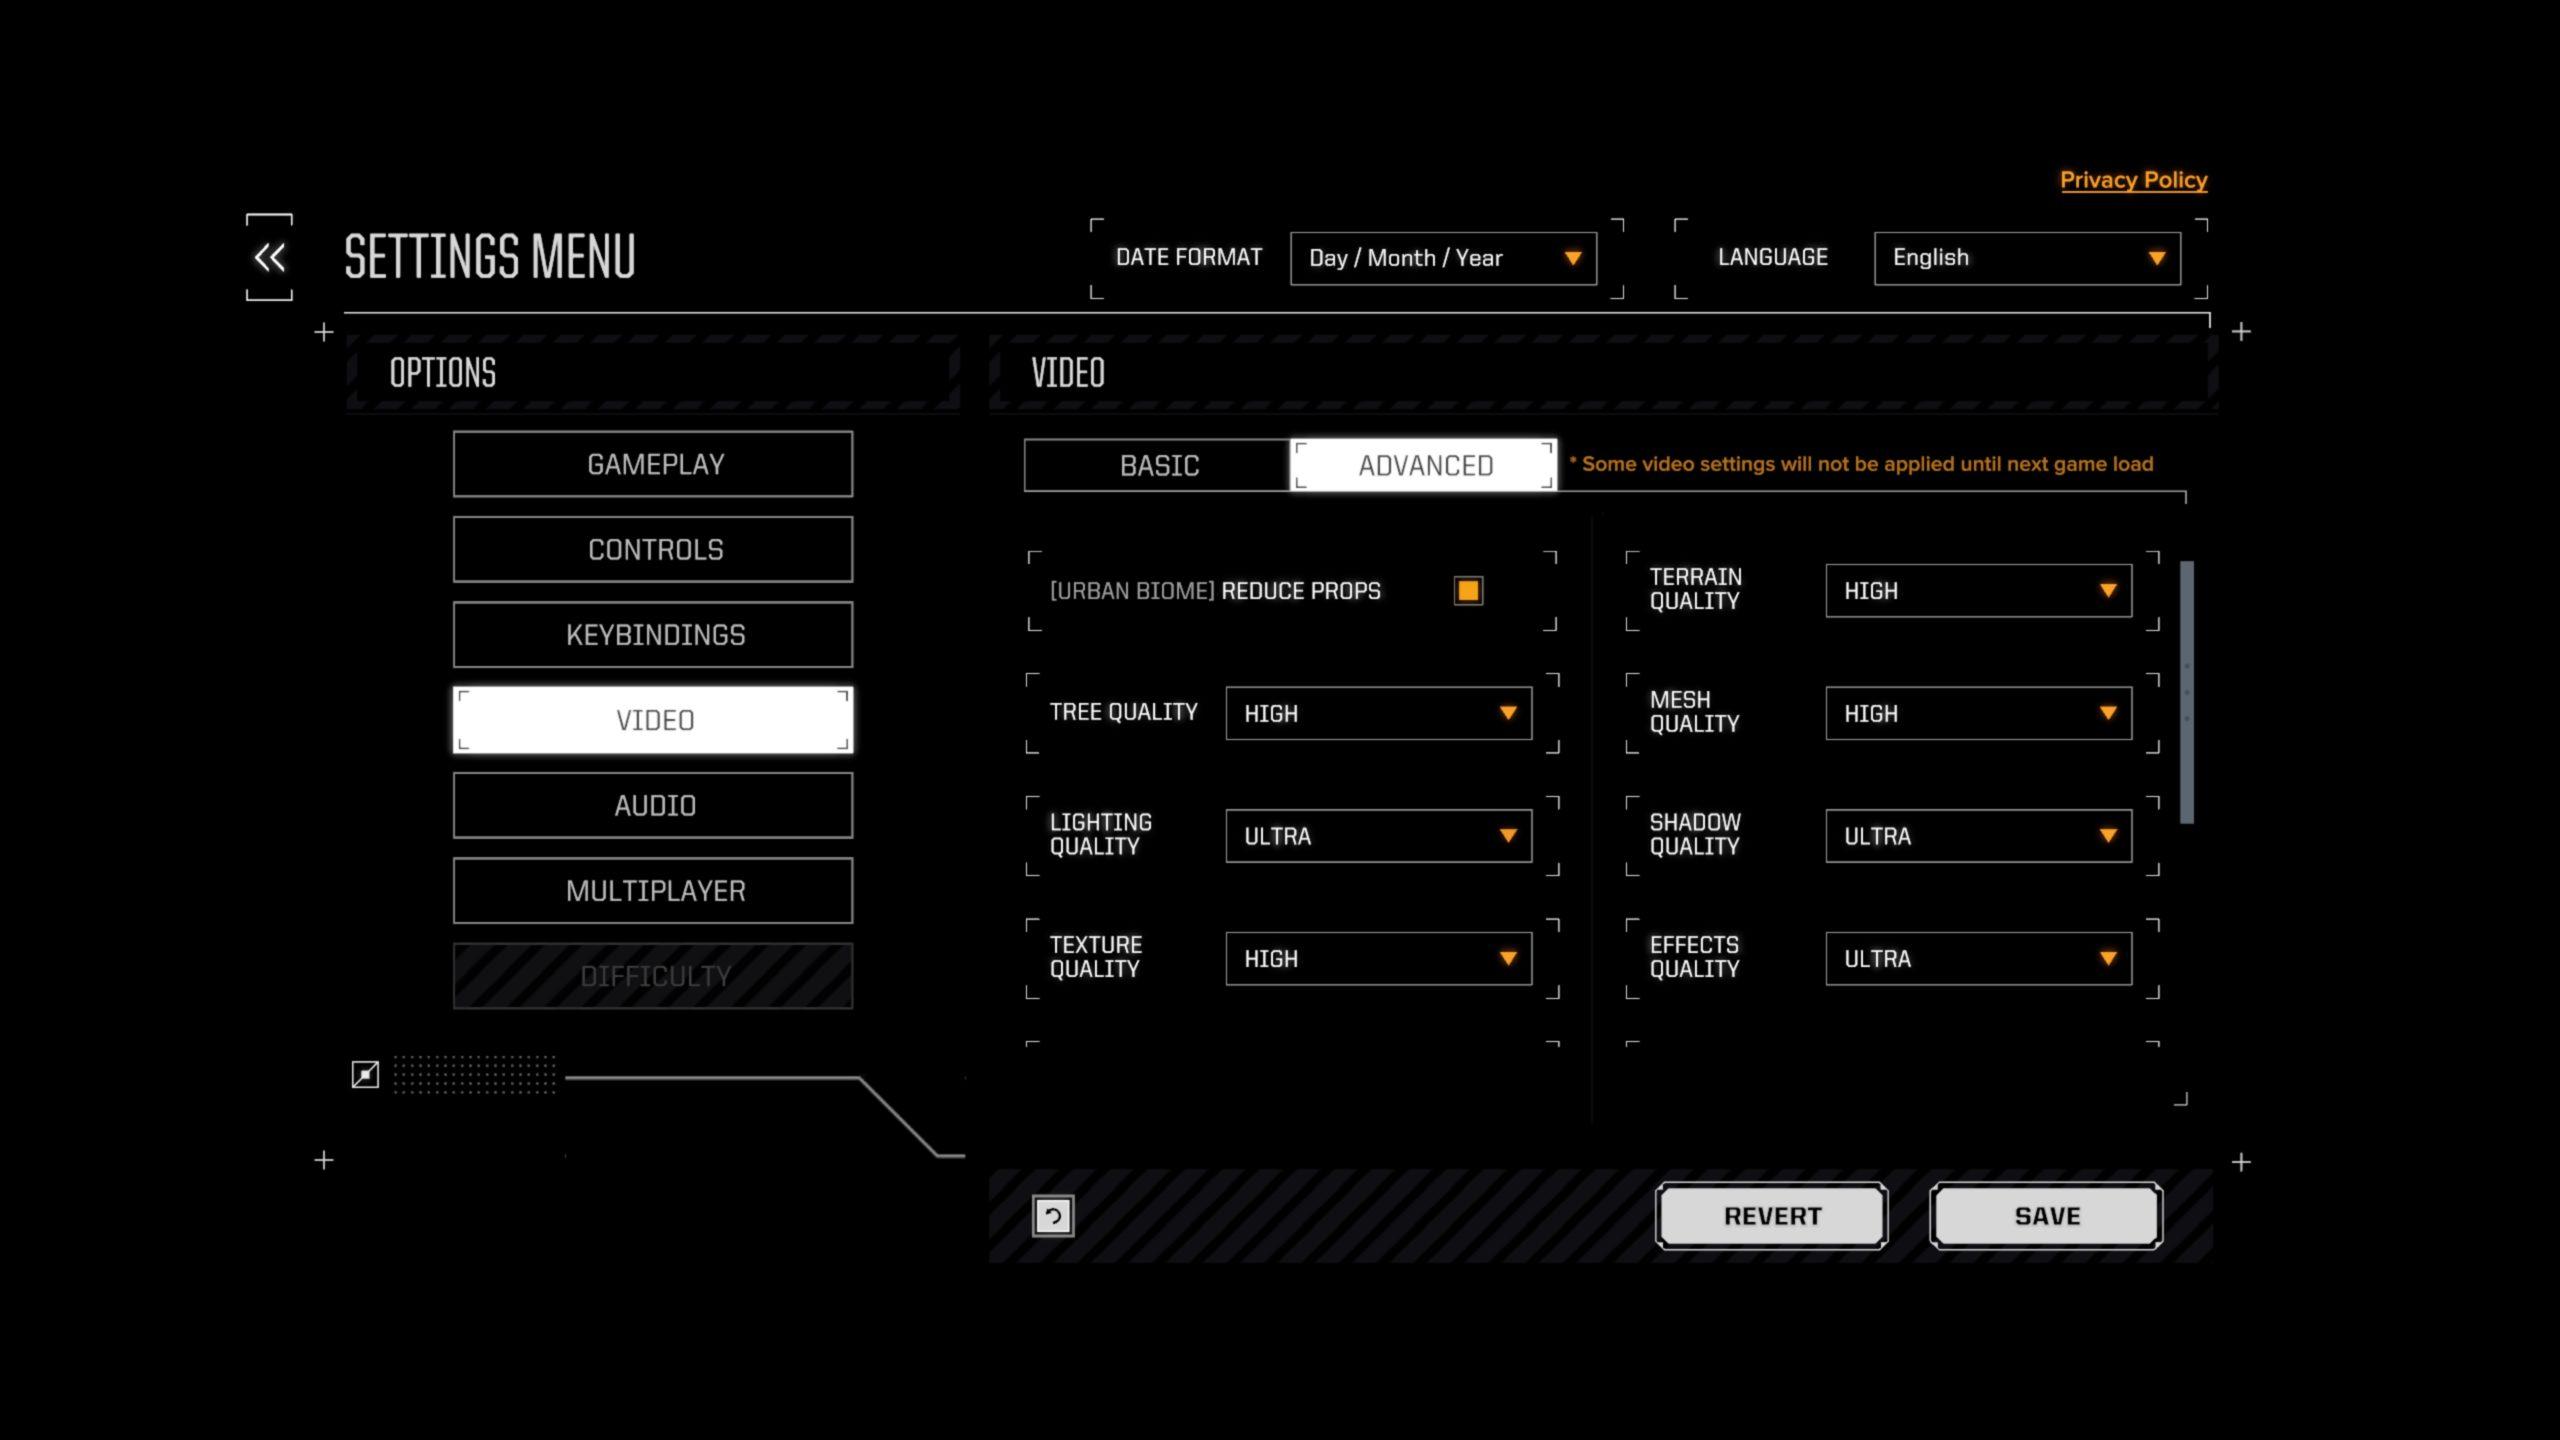 Battletech on RX 5700 XT at 1440p, Ultra settings